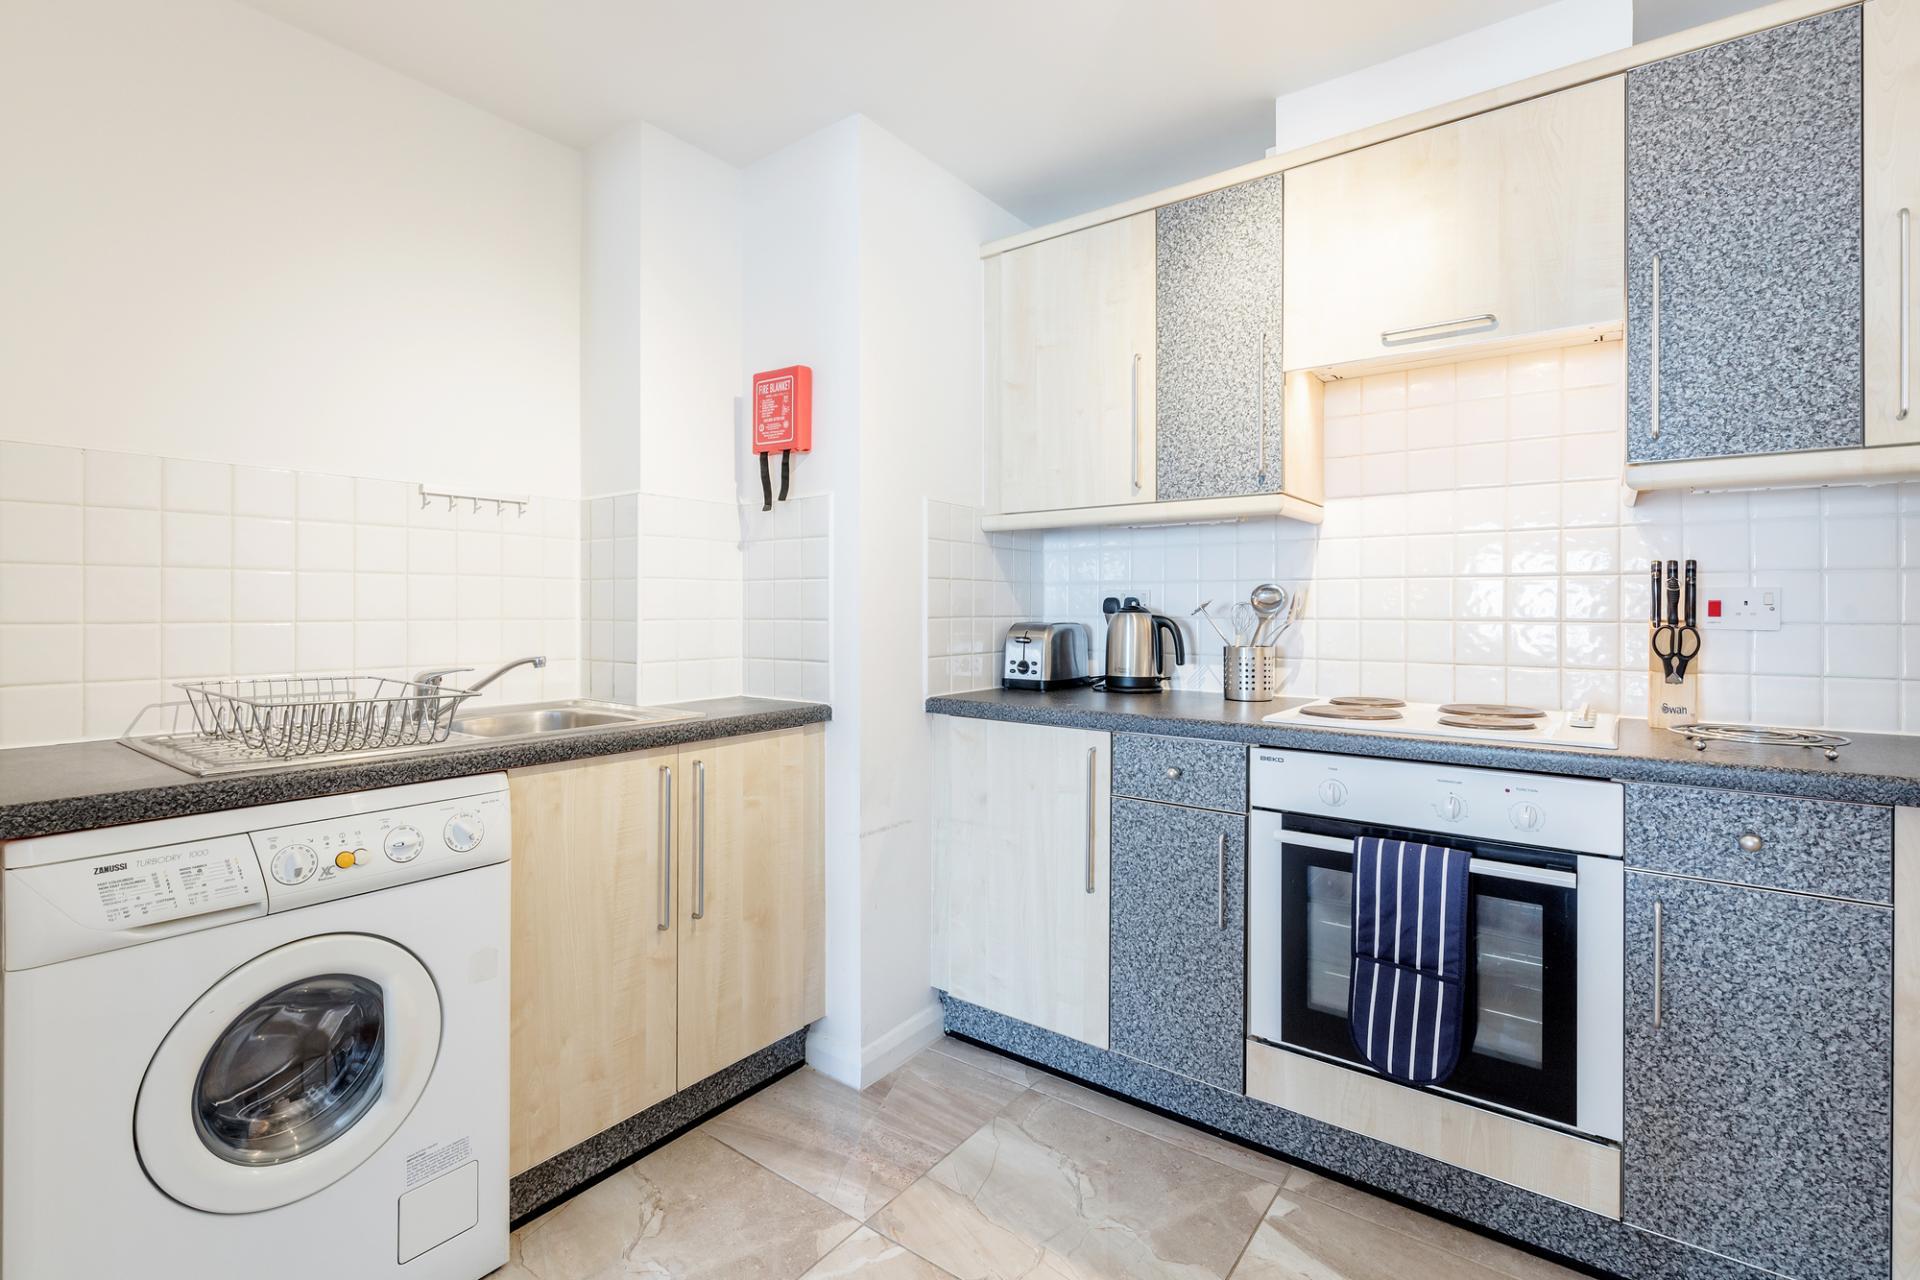 Kitchen at Regents Court, Kingston upon Thames, London - Citybase Apartments